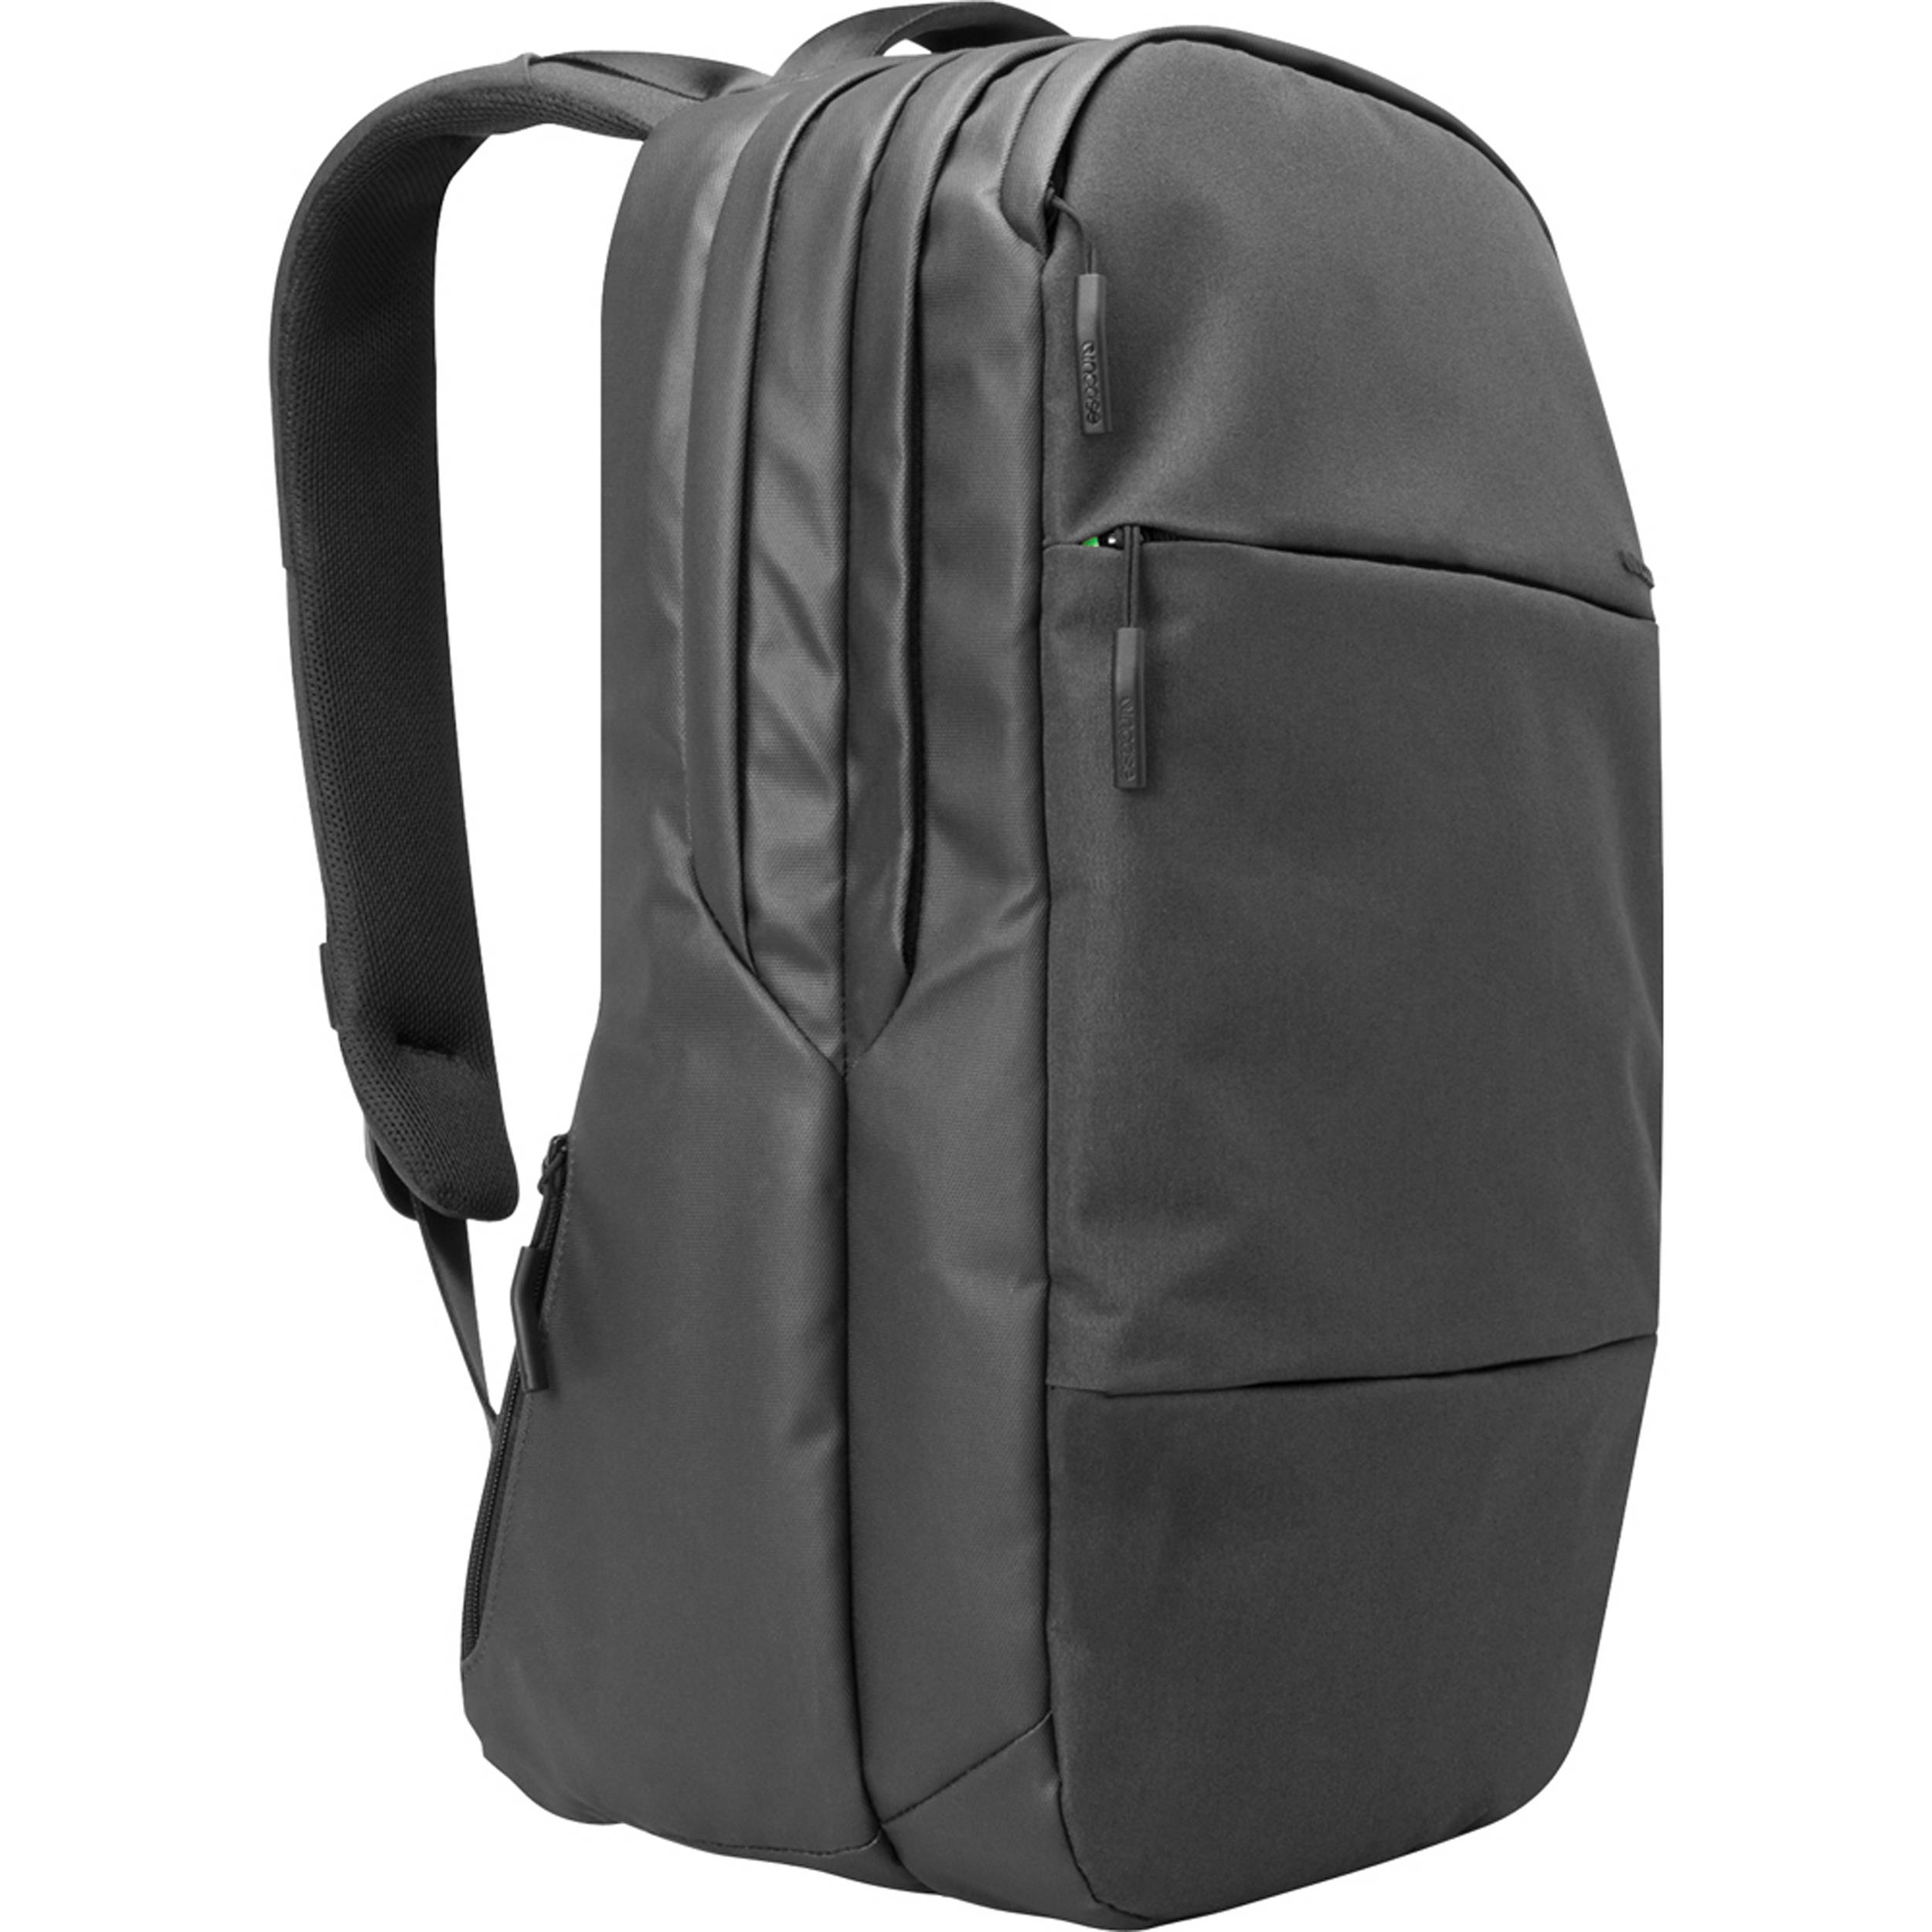 d356d679d486 Incase Designs Corp City Backpack for 17